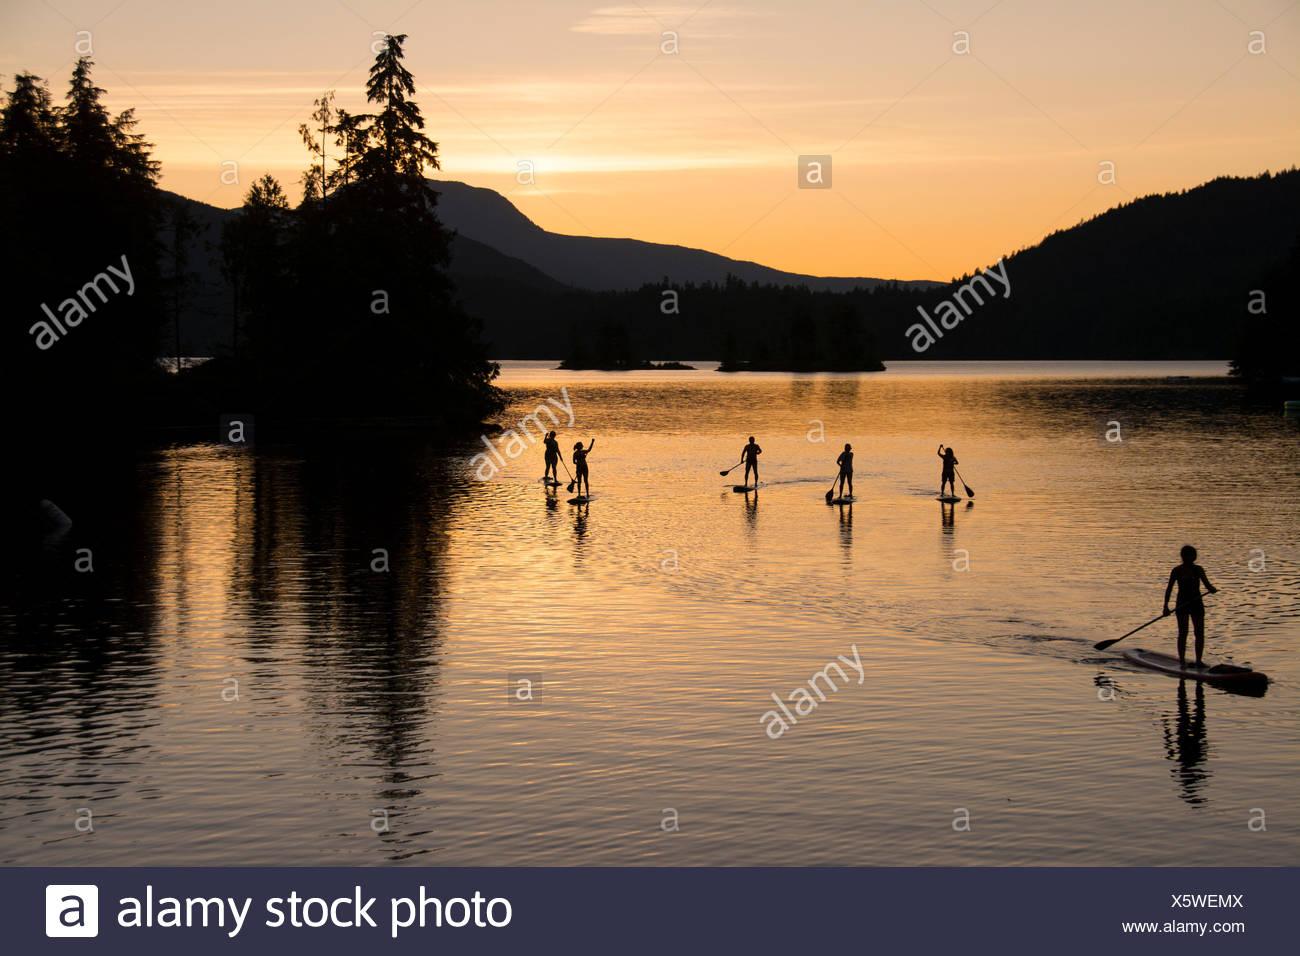 Stand Up Paddleboard gruppo sul lago Rubino, Sunshine Coast, British Columbia, Canada Immagini Stock